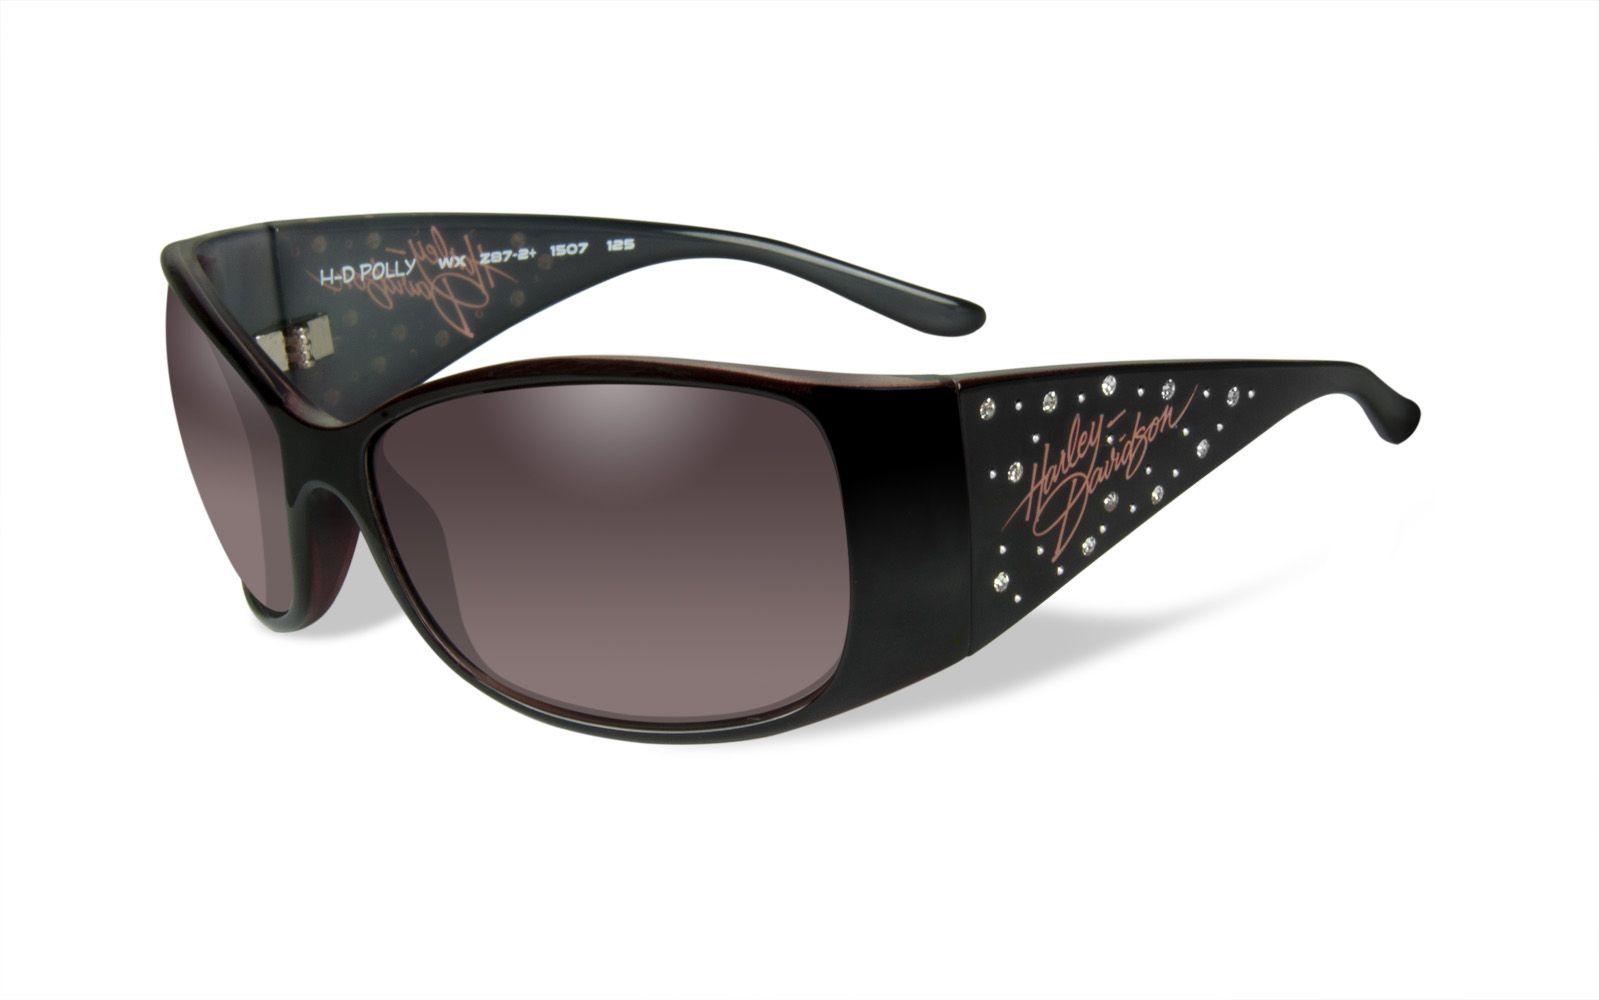 f8209529beb7 Harley-Davidson® Wiley-X G Polly Black Sun-glasses Pink Fade Lens +Case -  House of Harley-Davidson